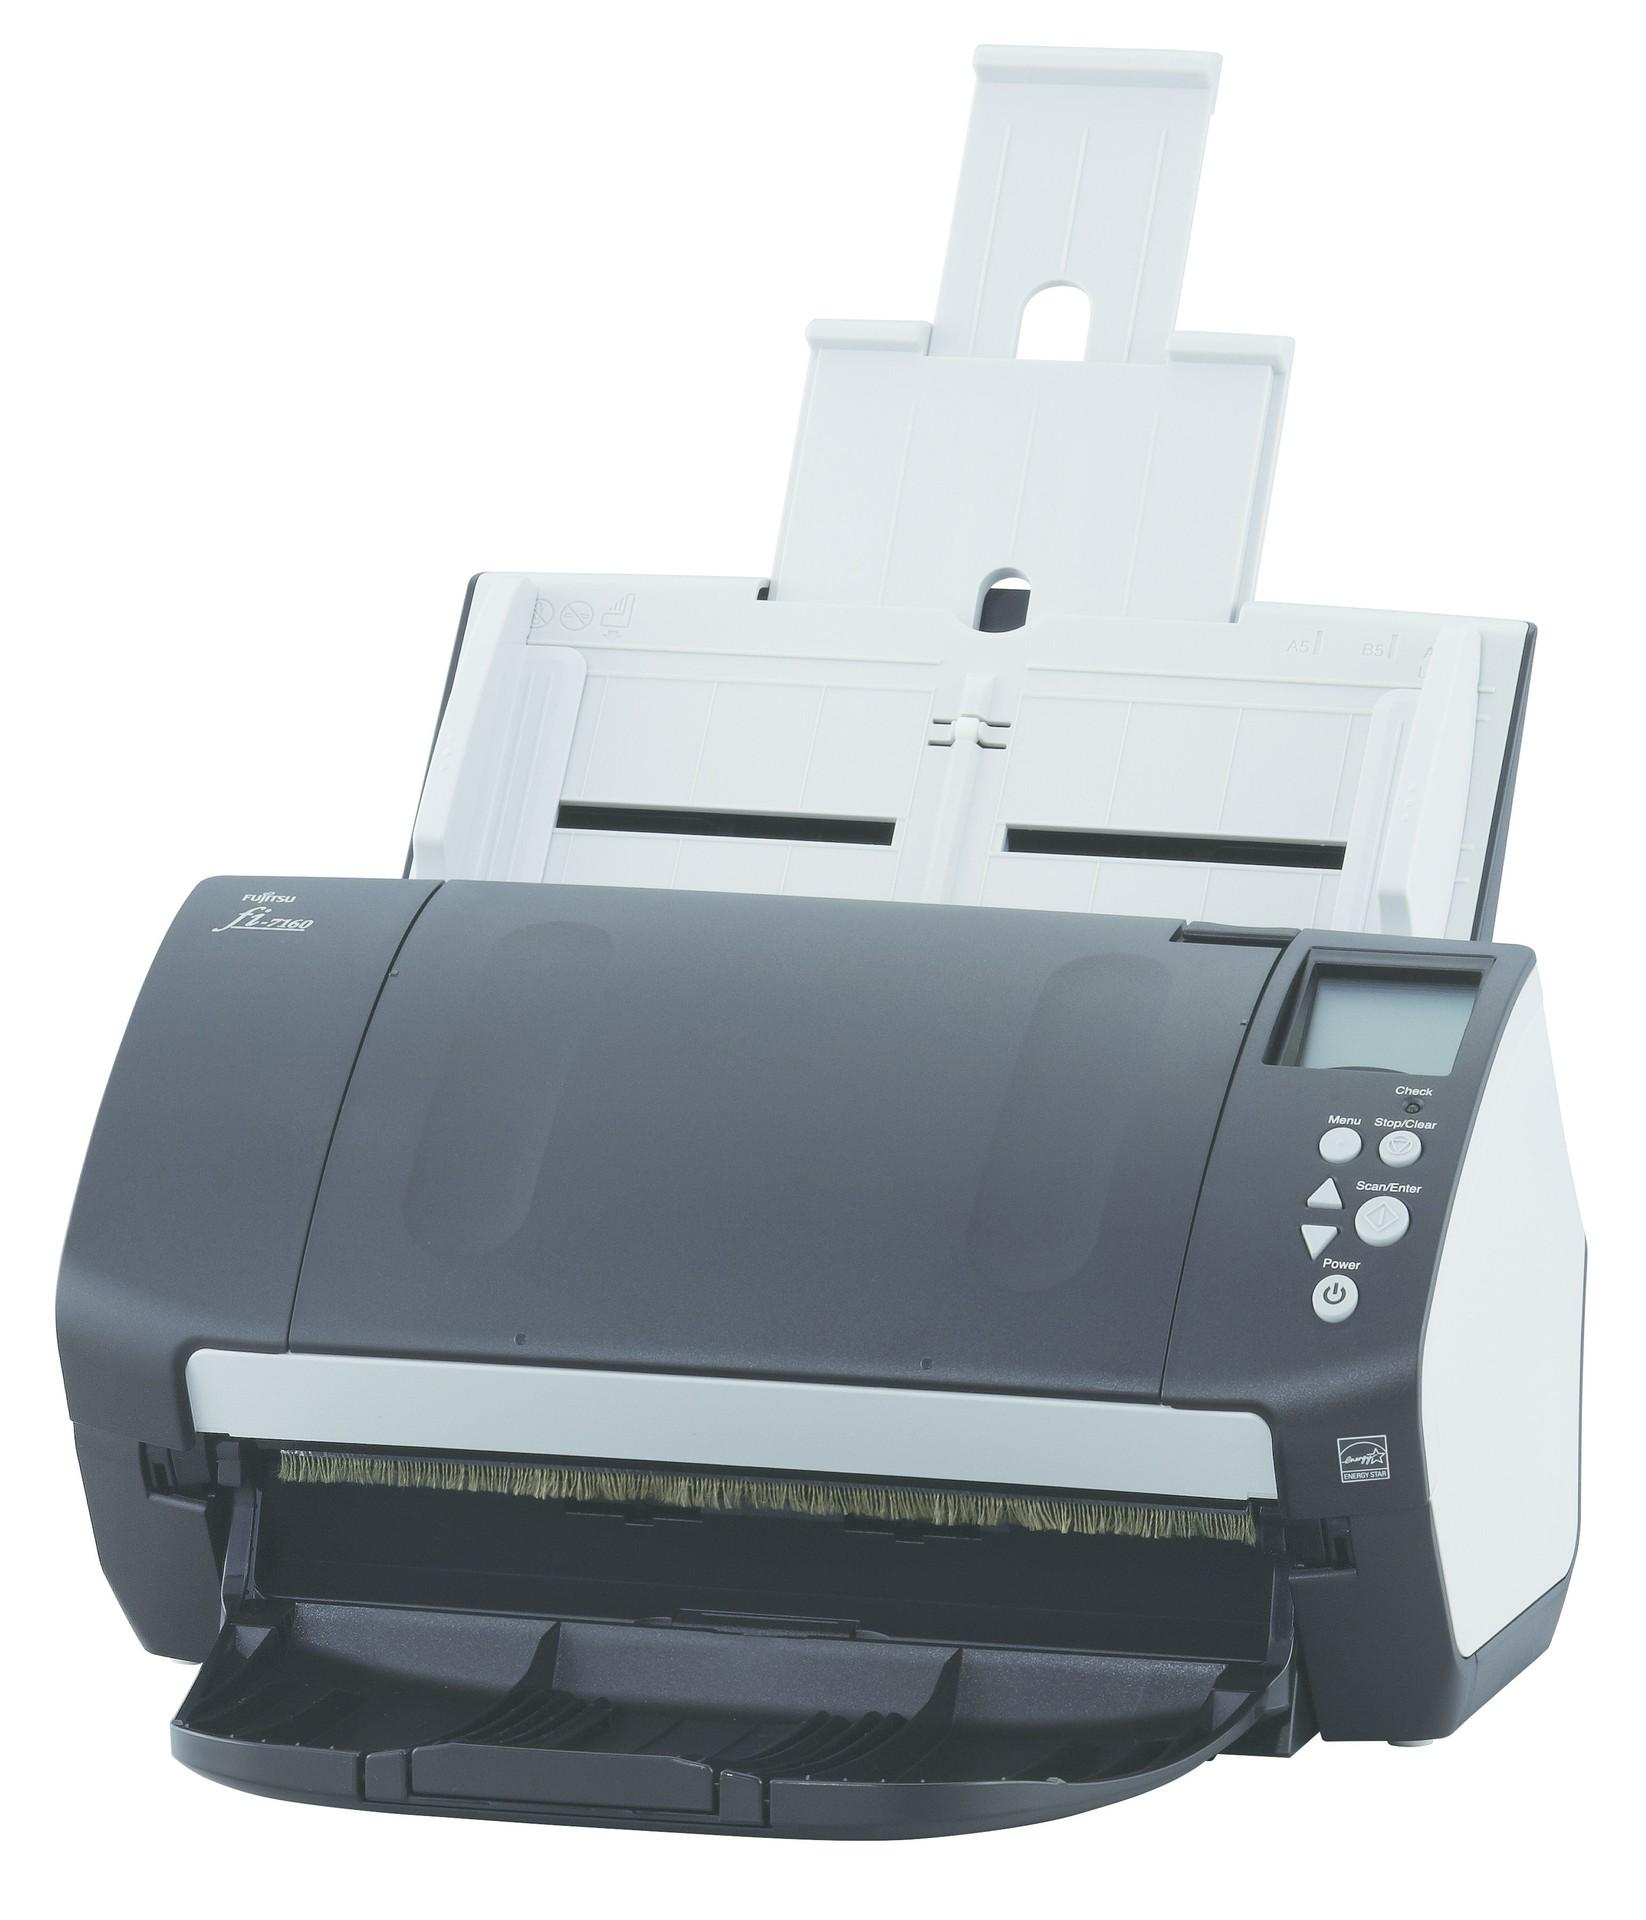 Fujitsu Scanner FI-7160 ADF 60ppm